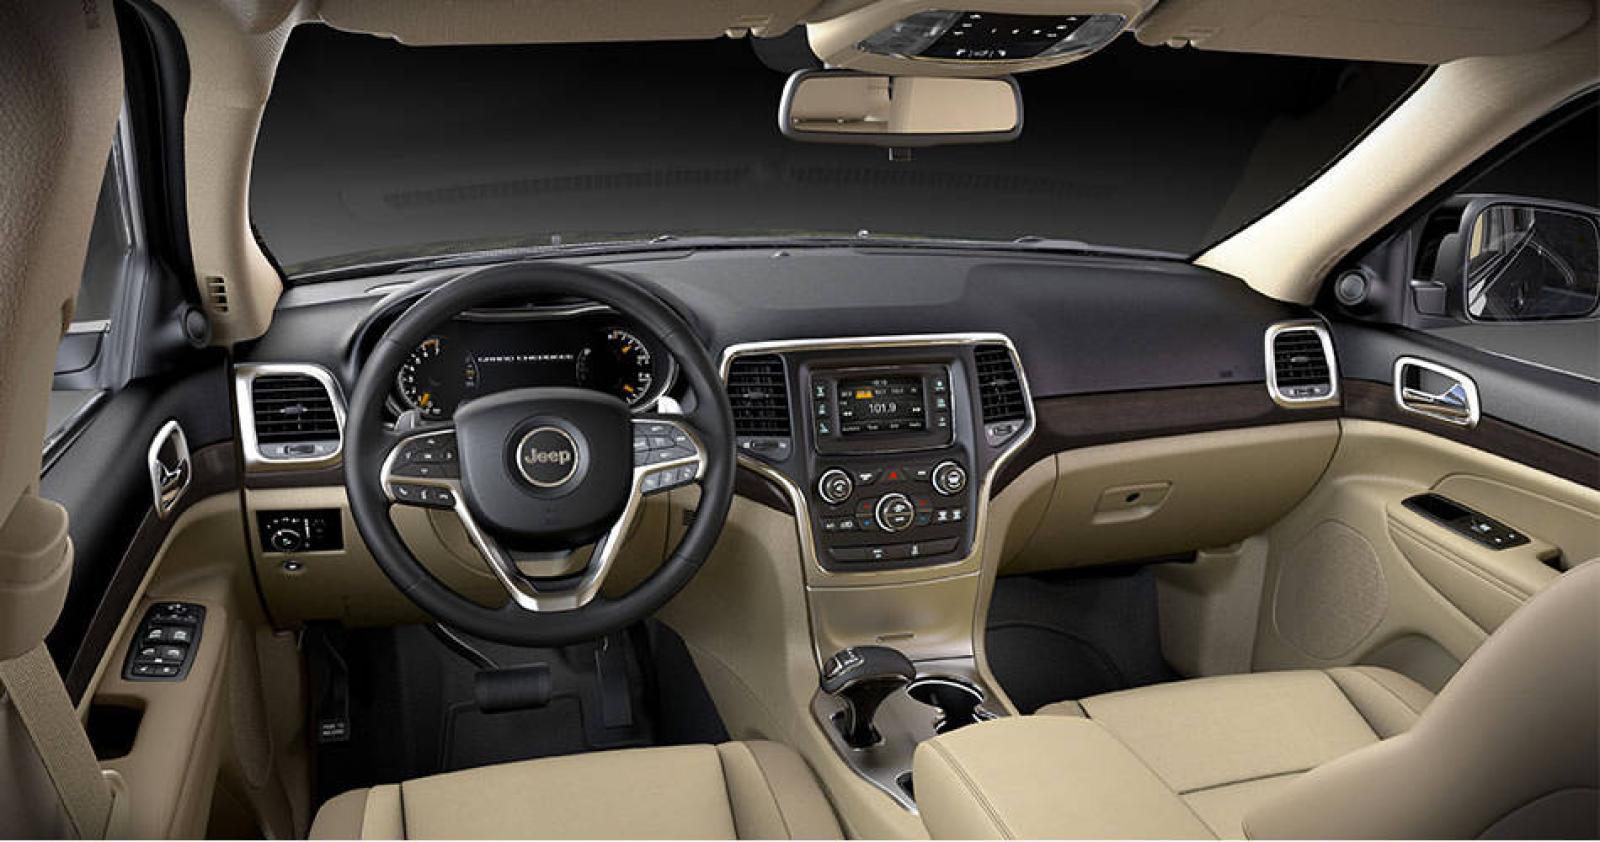 Jeep 2008 jeep grand cherokee interior : 2015 Jeep Grand Cherokee - Information and photos - ZombieDrive